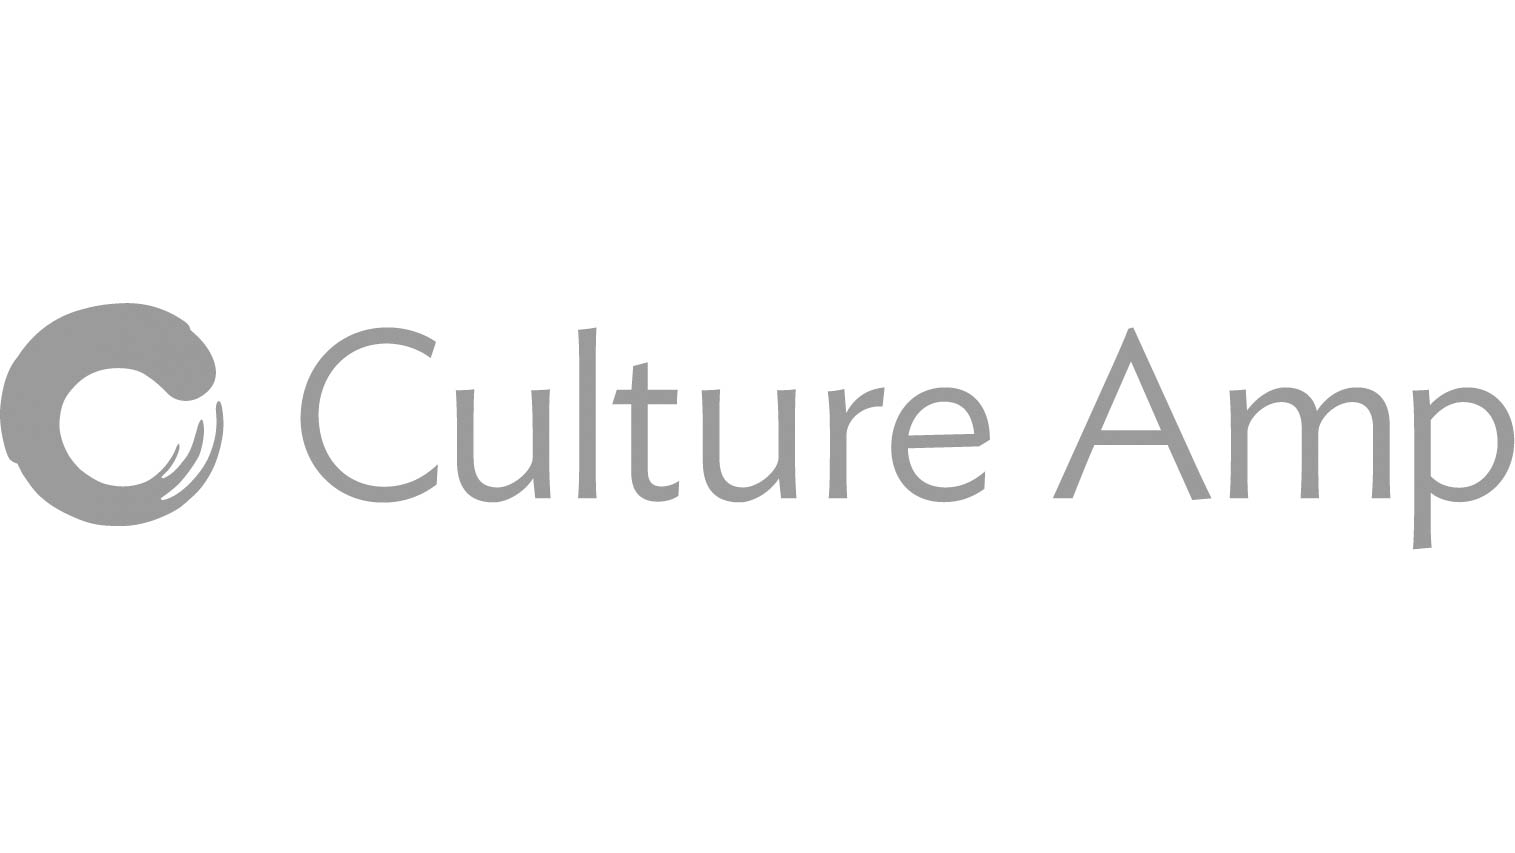 Culture Amp-BW.jpg